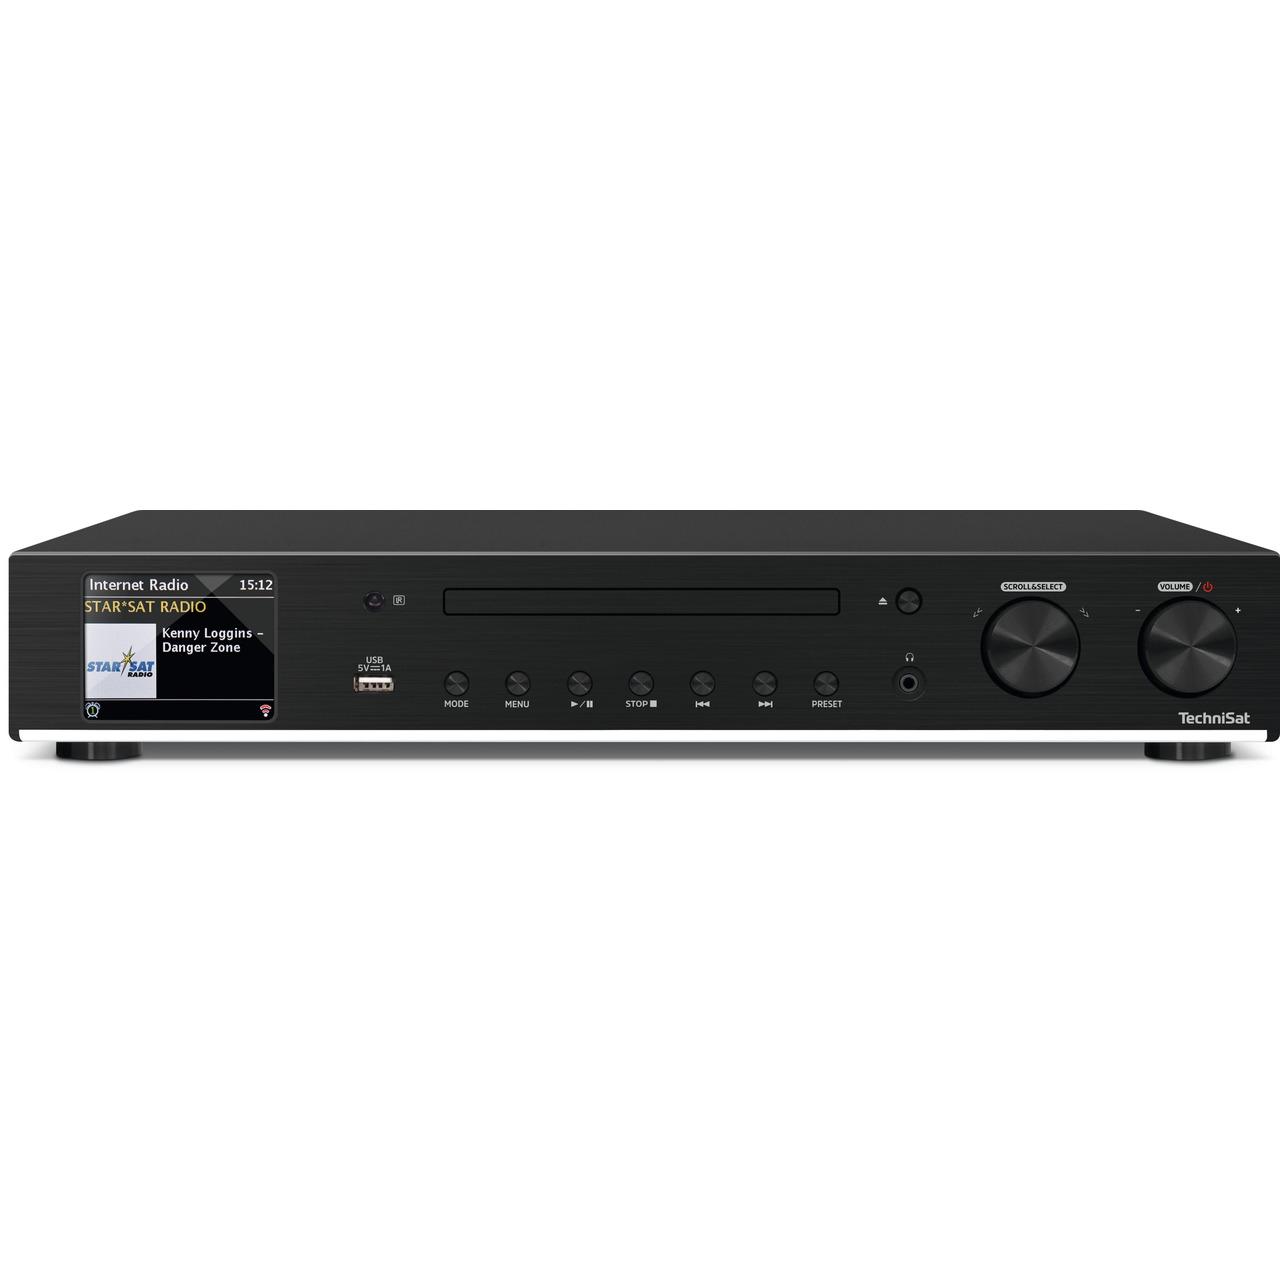 TechniSat Radio-Hi-Fi-Tuner DigitRadio 143 CD- DAB+-UKW-Internetradio- USB- Bluetooth- CD-Player